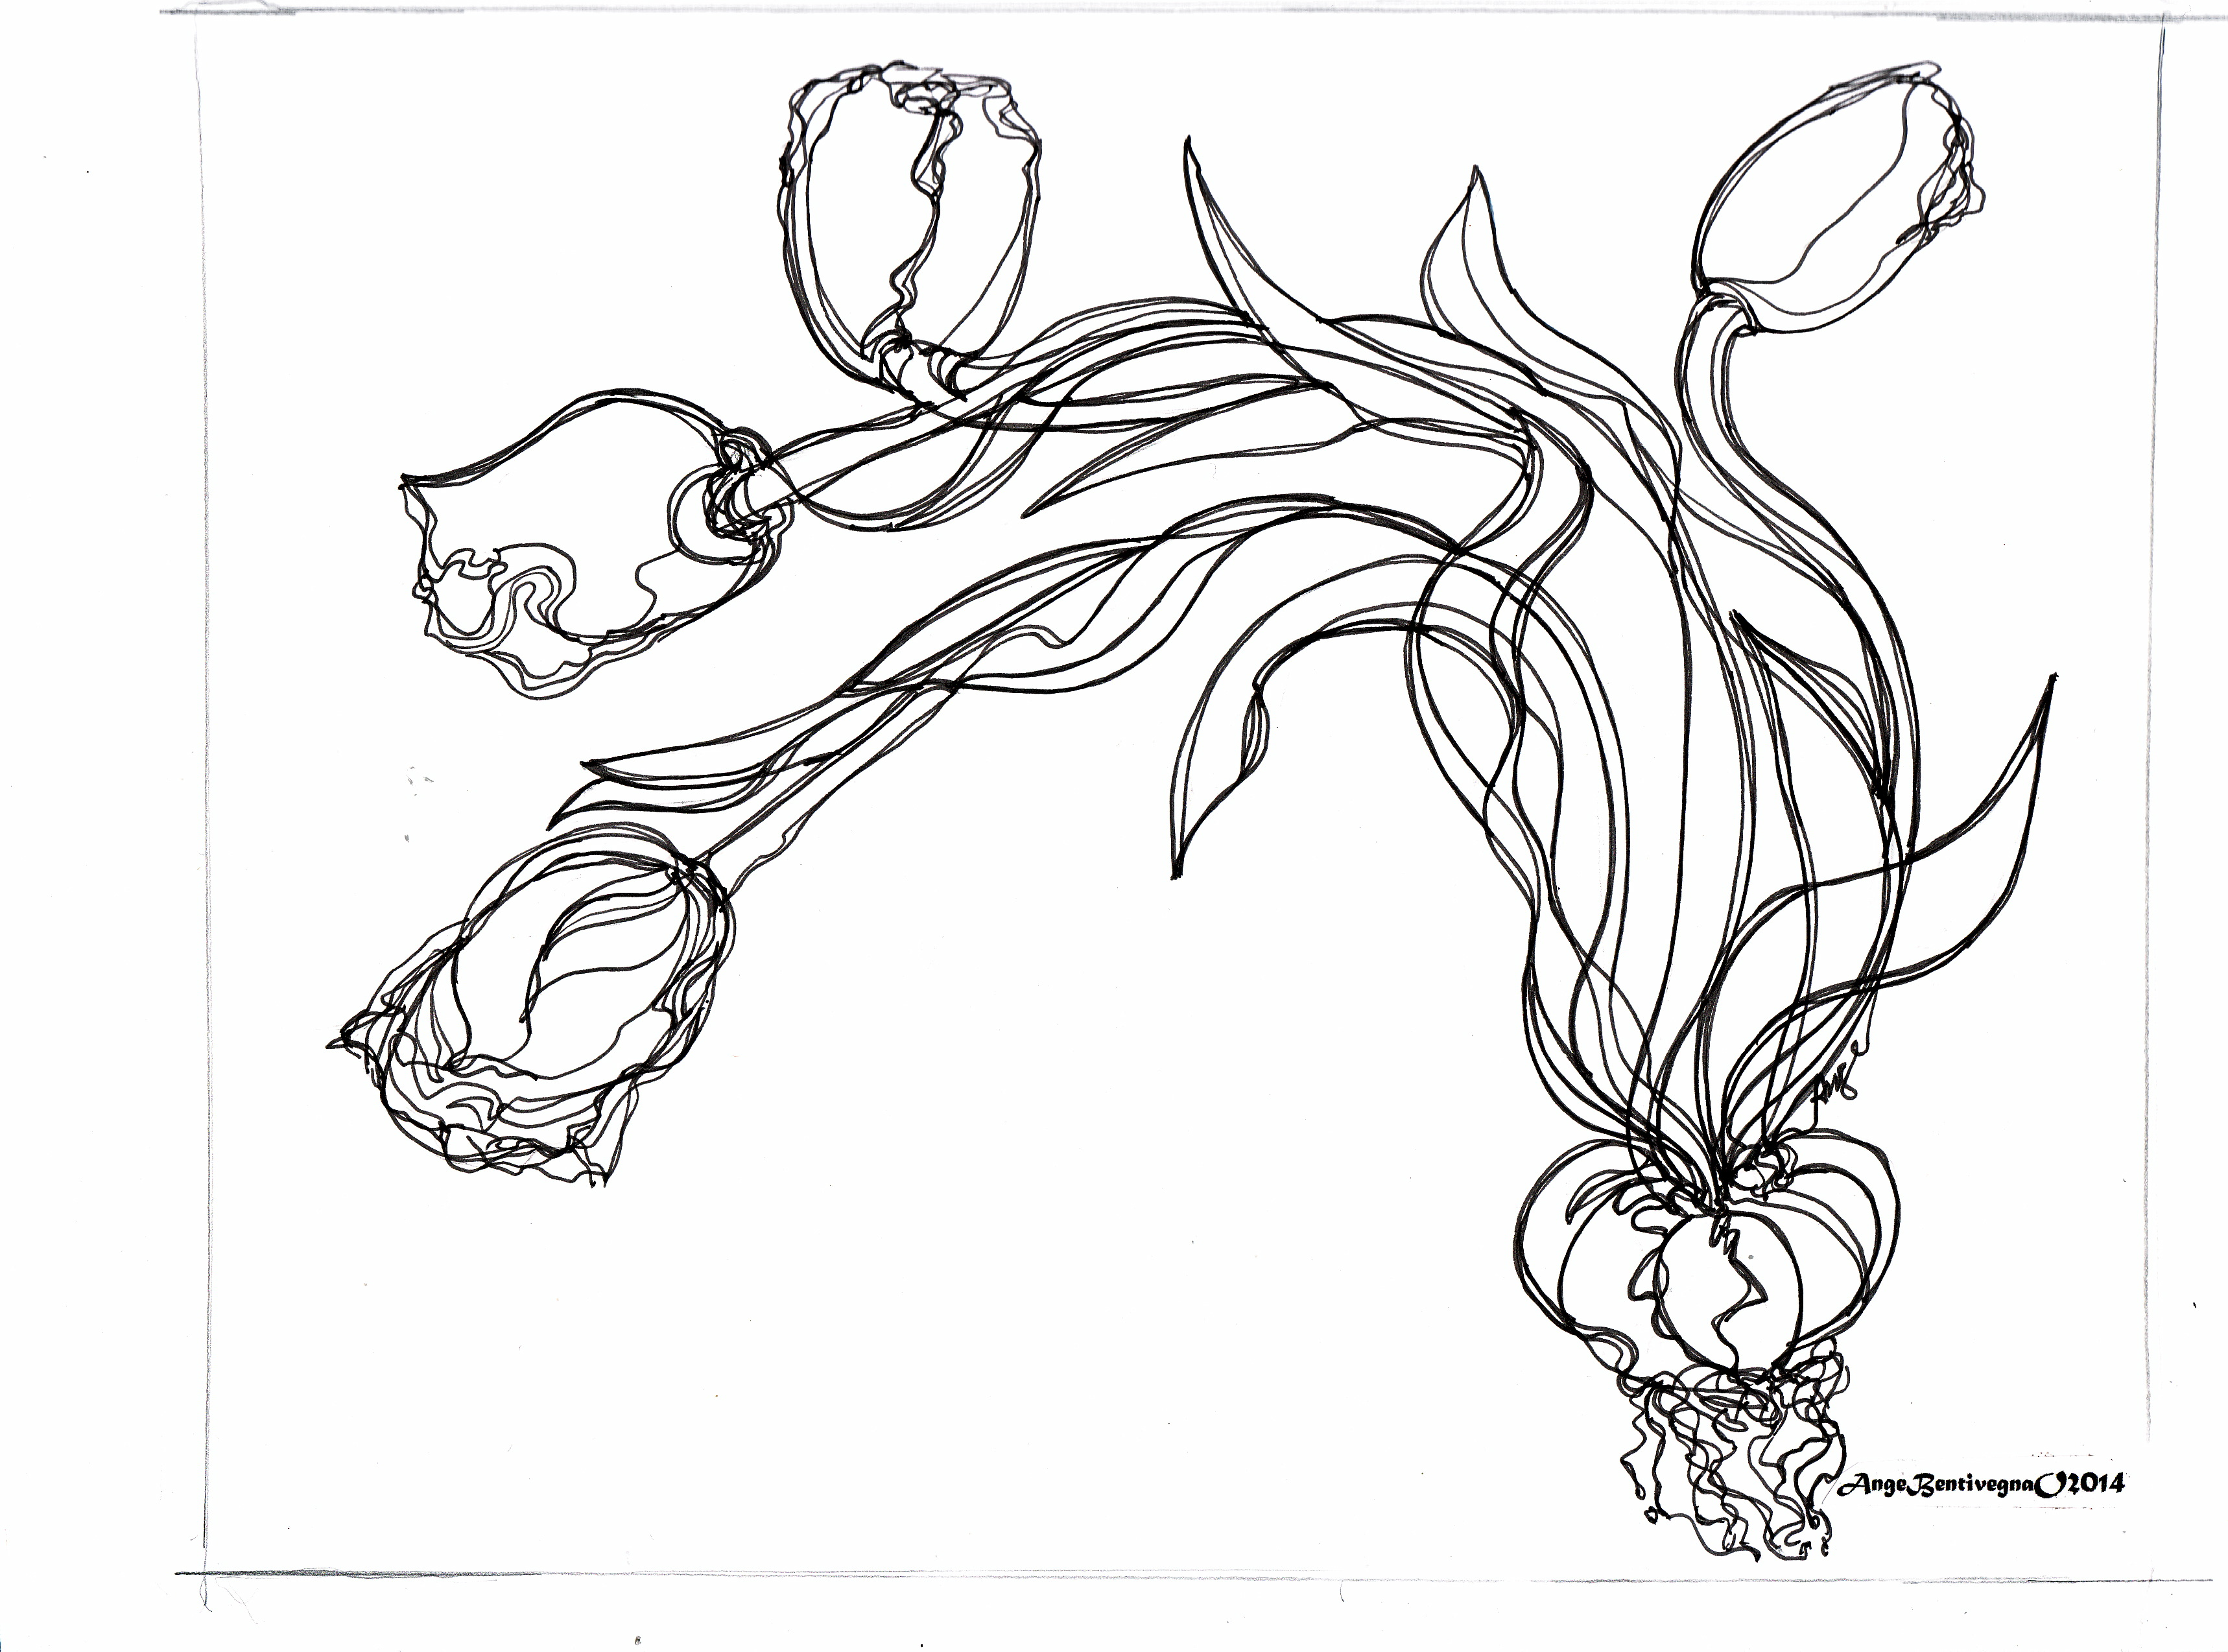 tulipscopyrignt